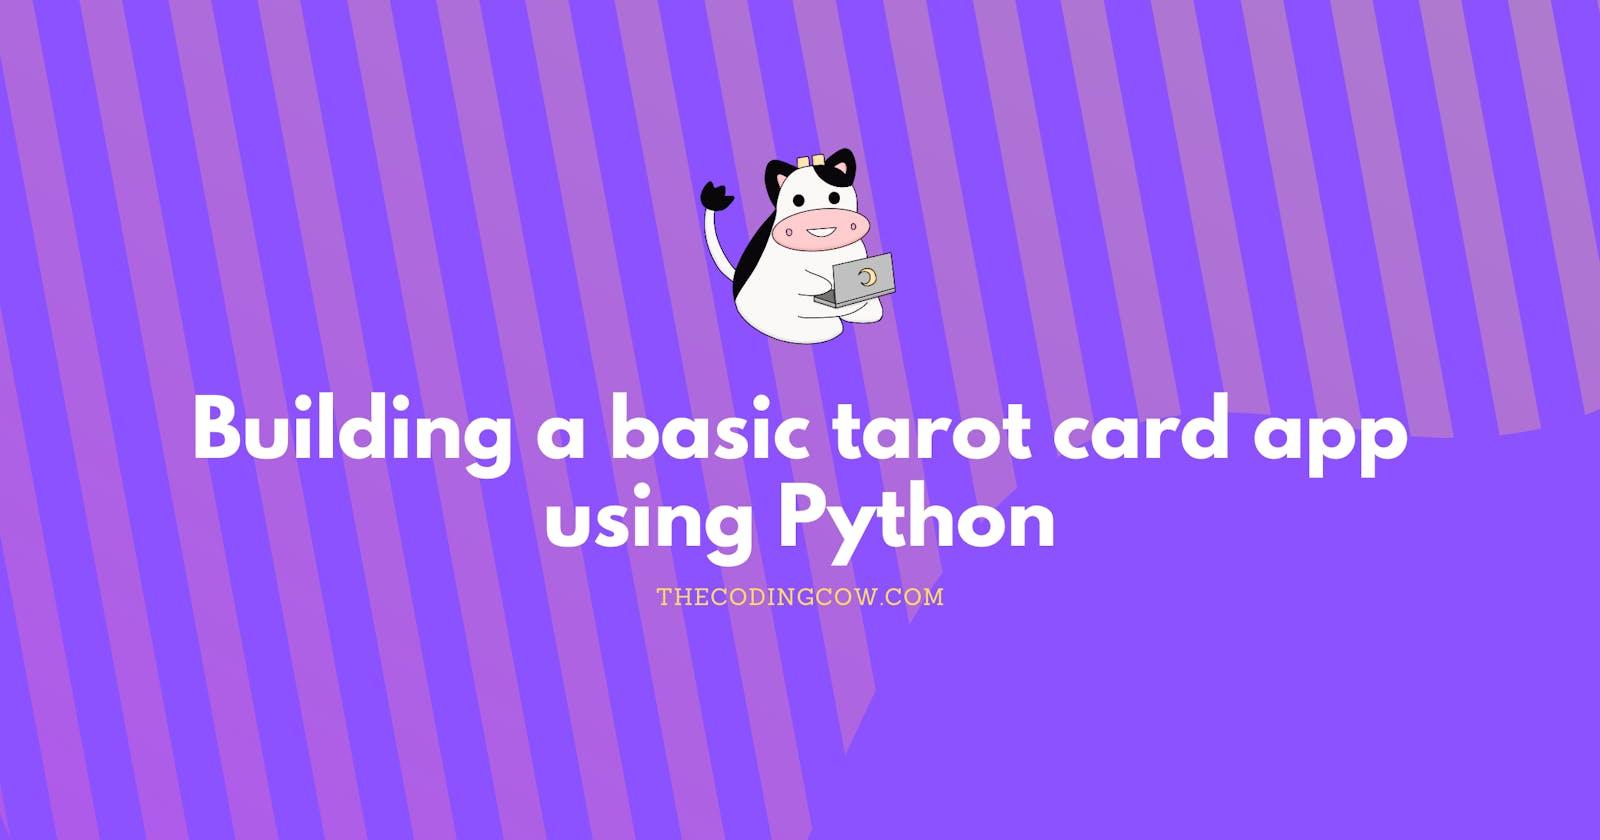 Building a basic tarot card app using Python